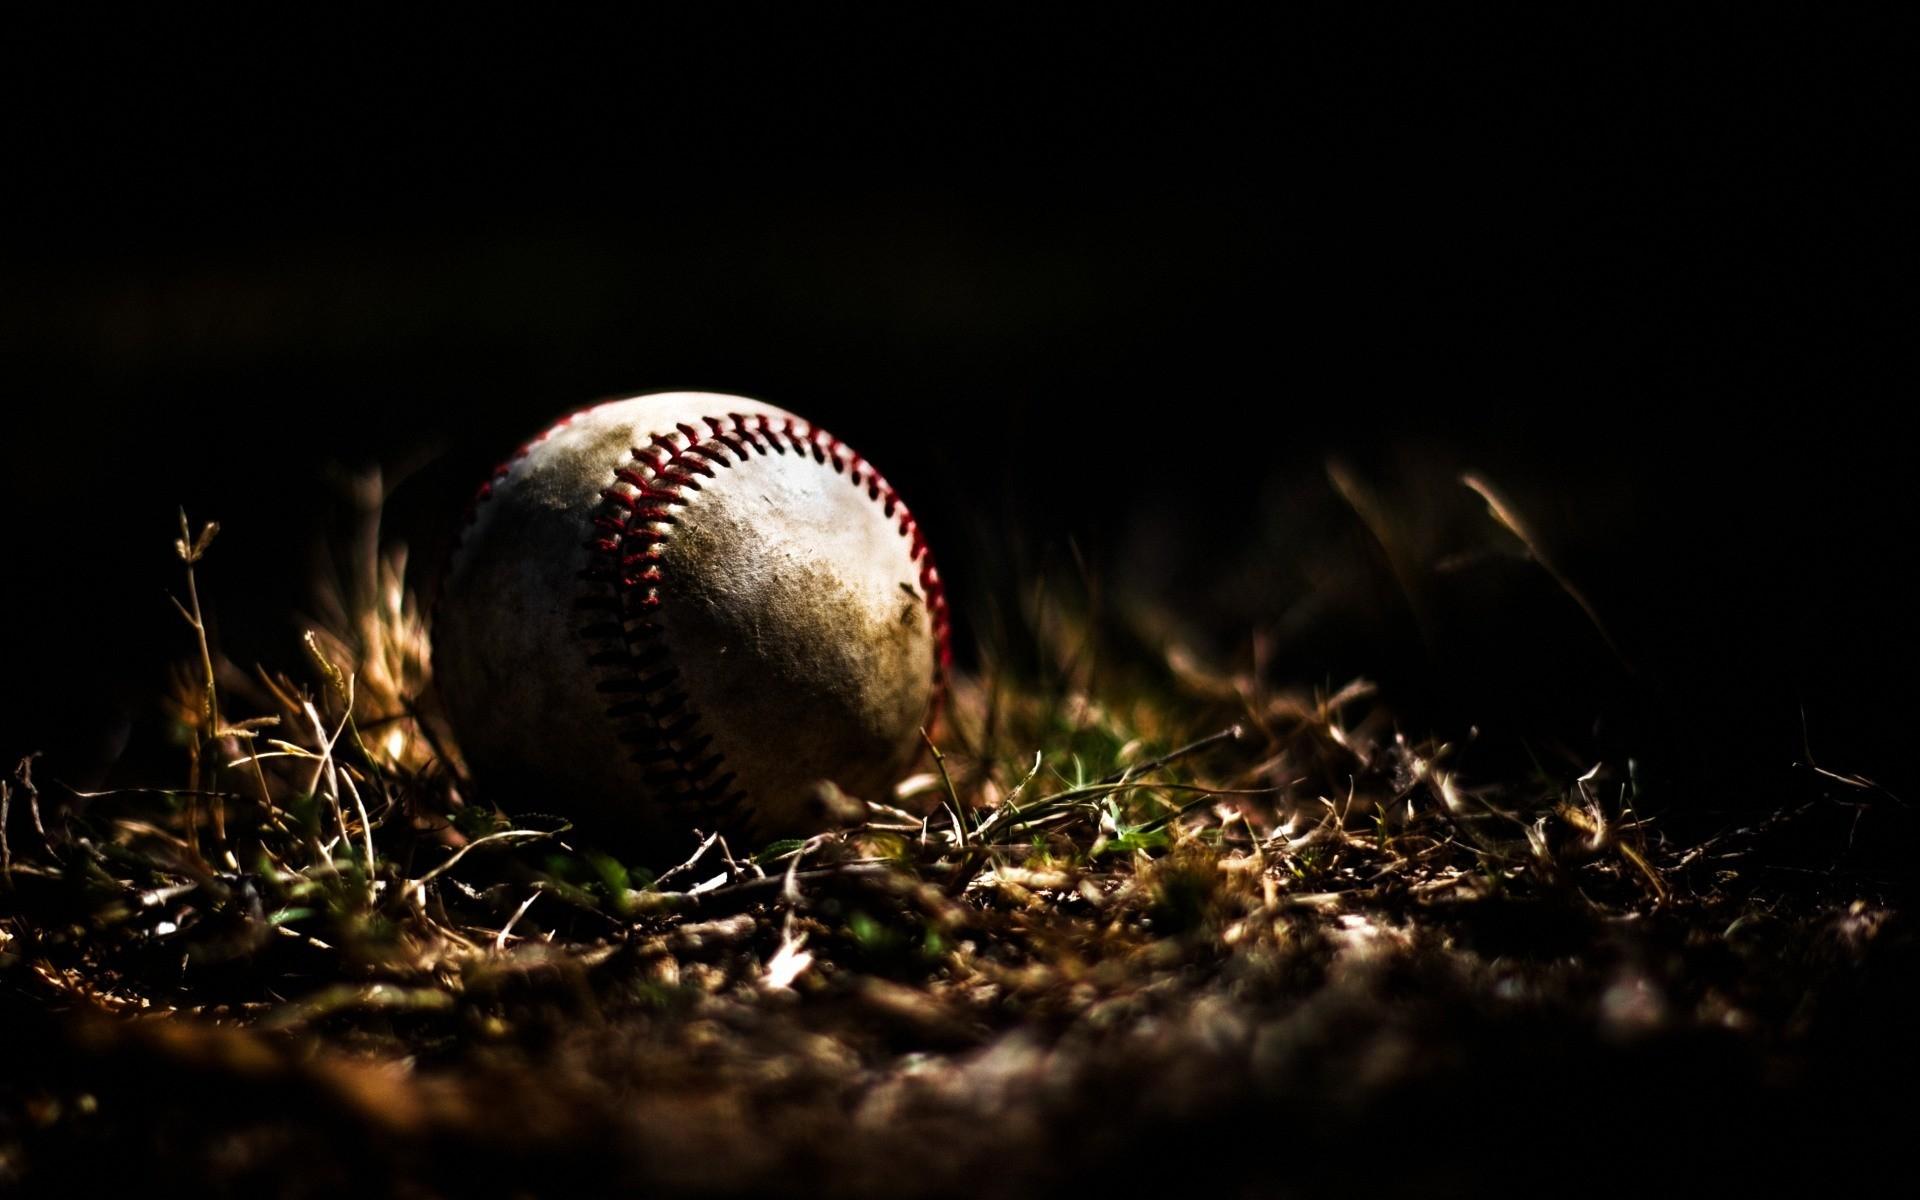 Baseball HD Wallpapers Backgrounds Wallpaper | HD Wallpapers | Pinterest | Baseball  wallpaper, Hd wallpaper and Wallpaper